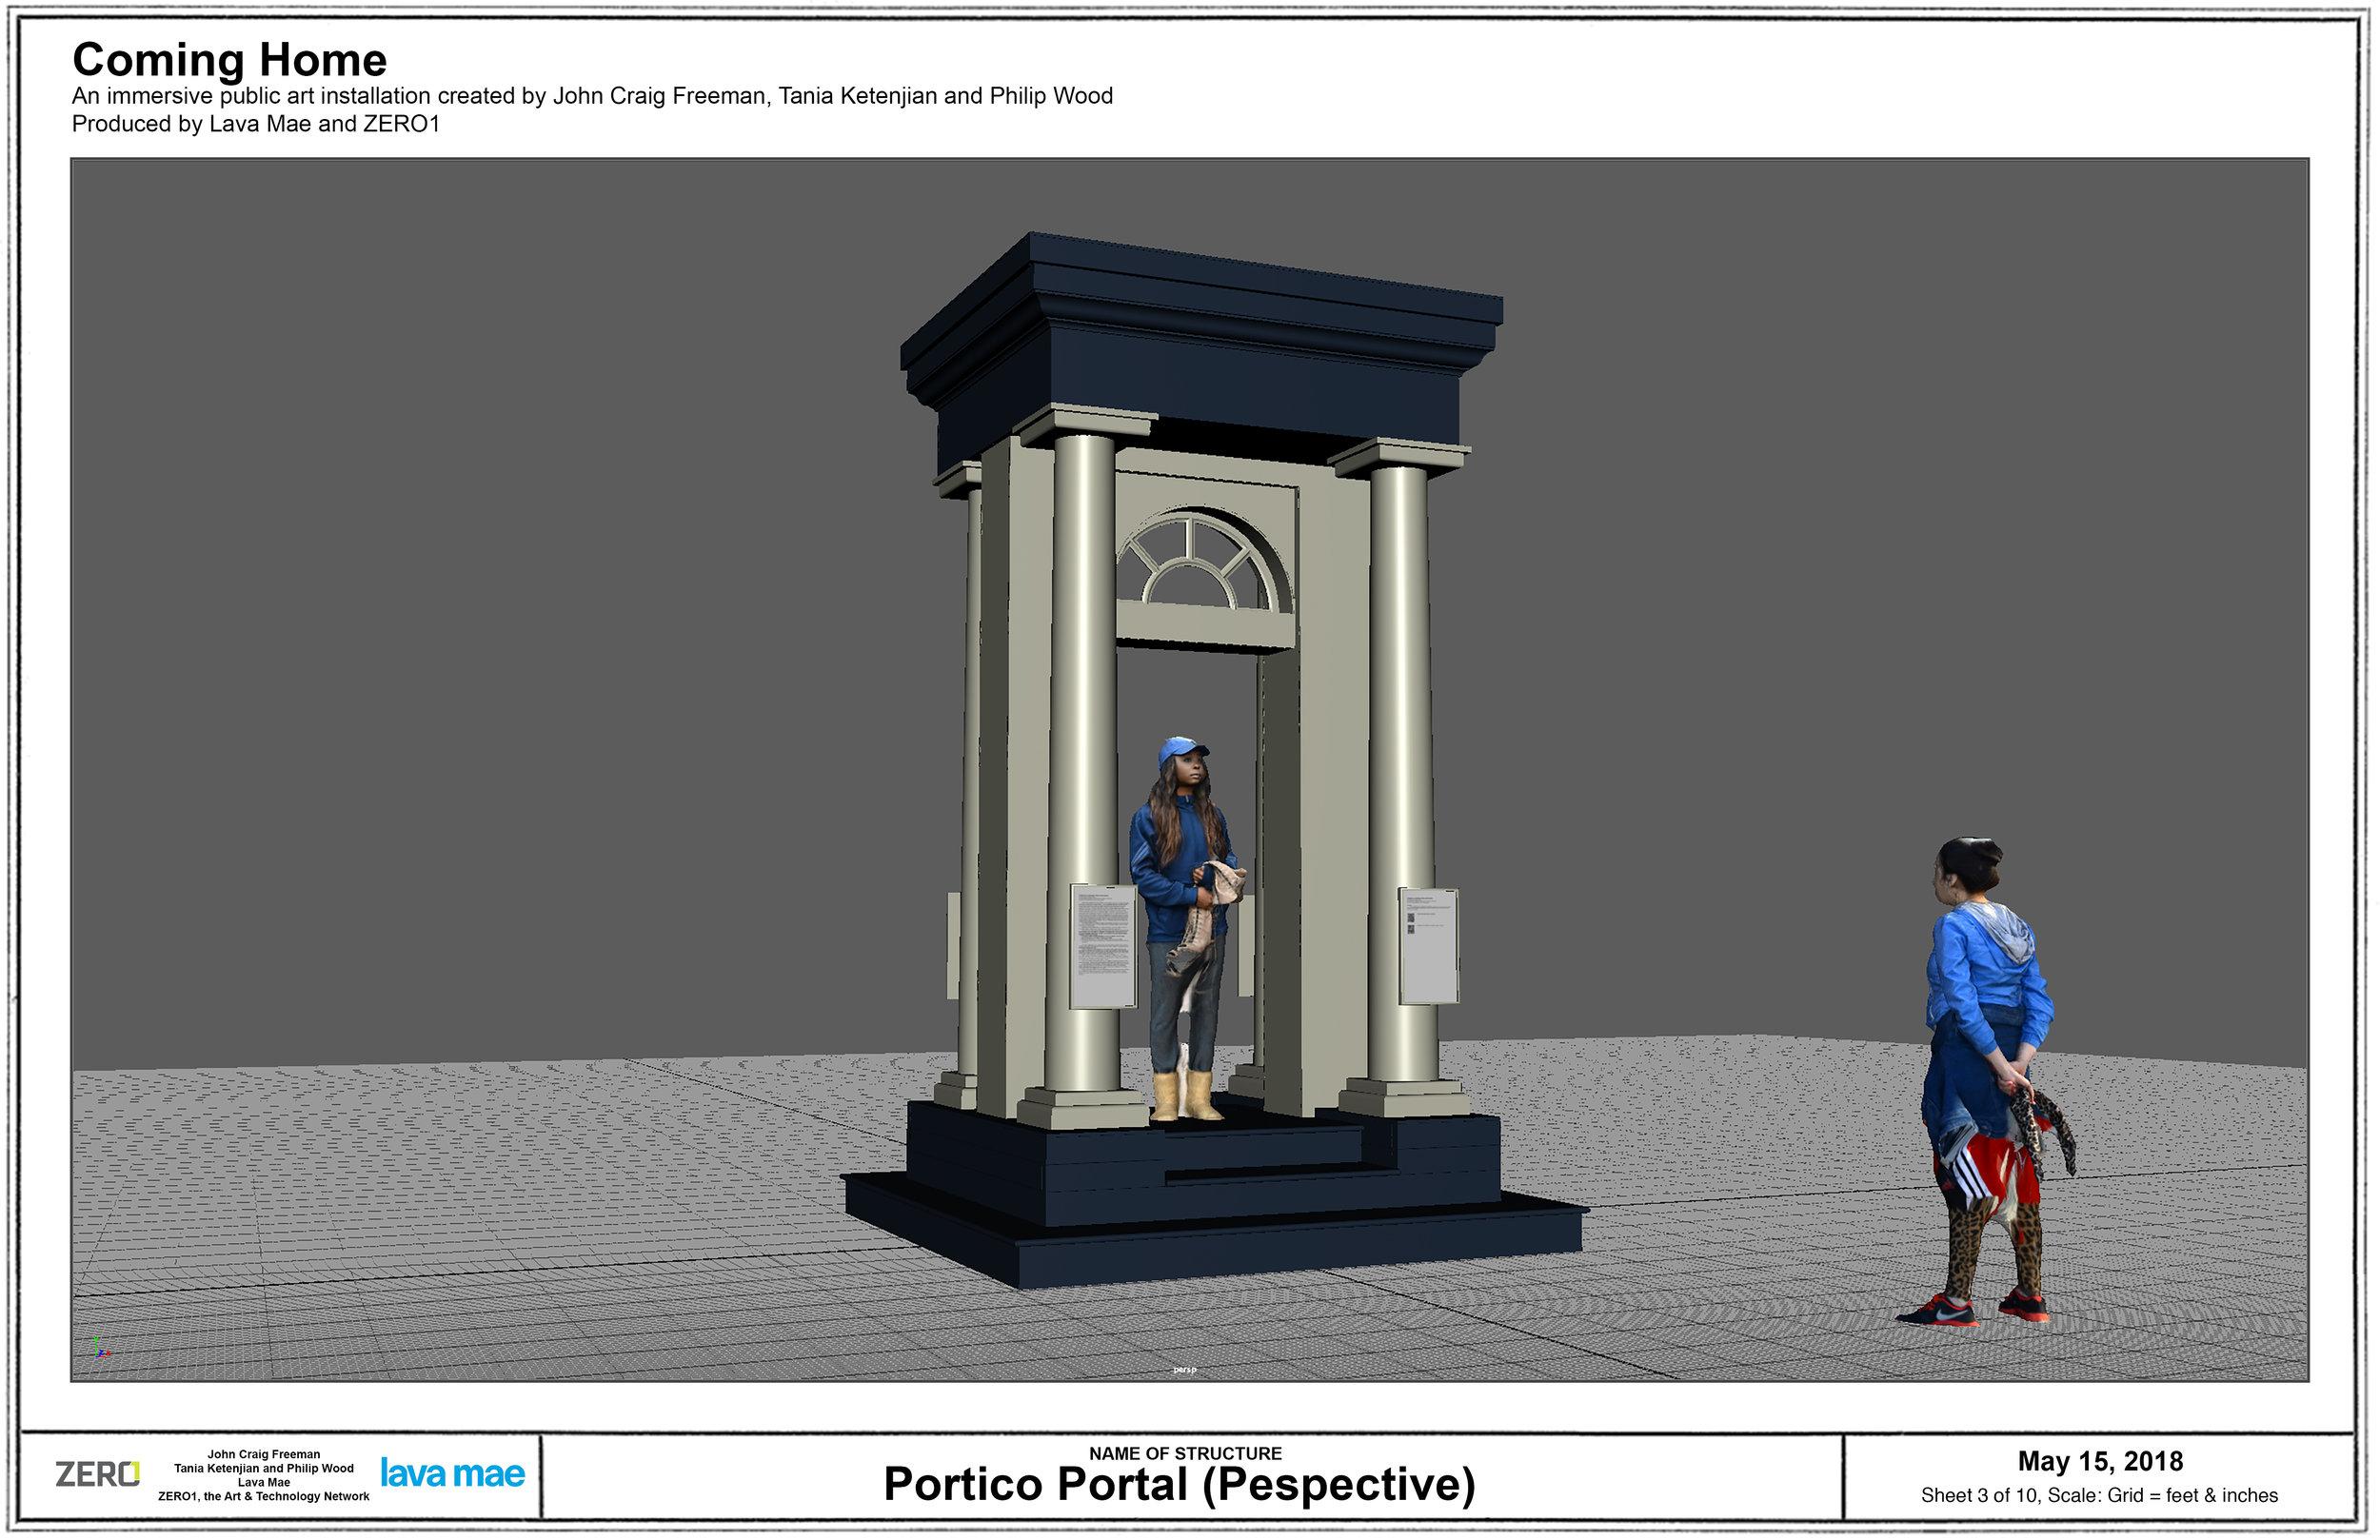 Portico_Portal_Plans_3_of_10_Perspective.jpg